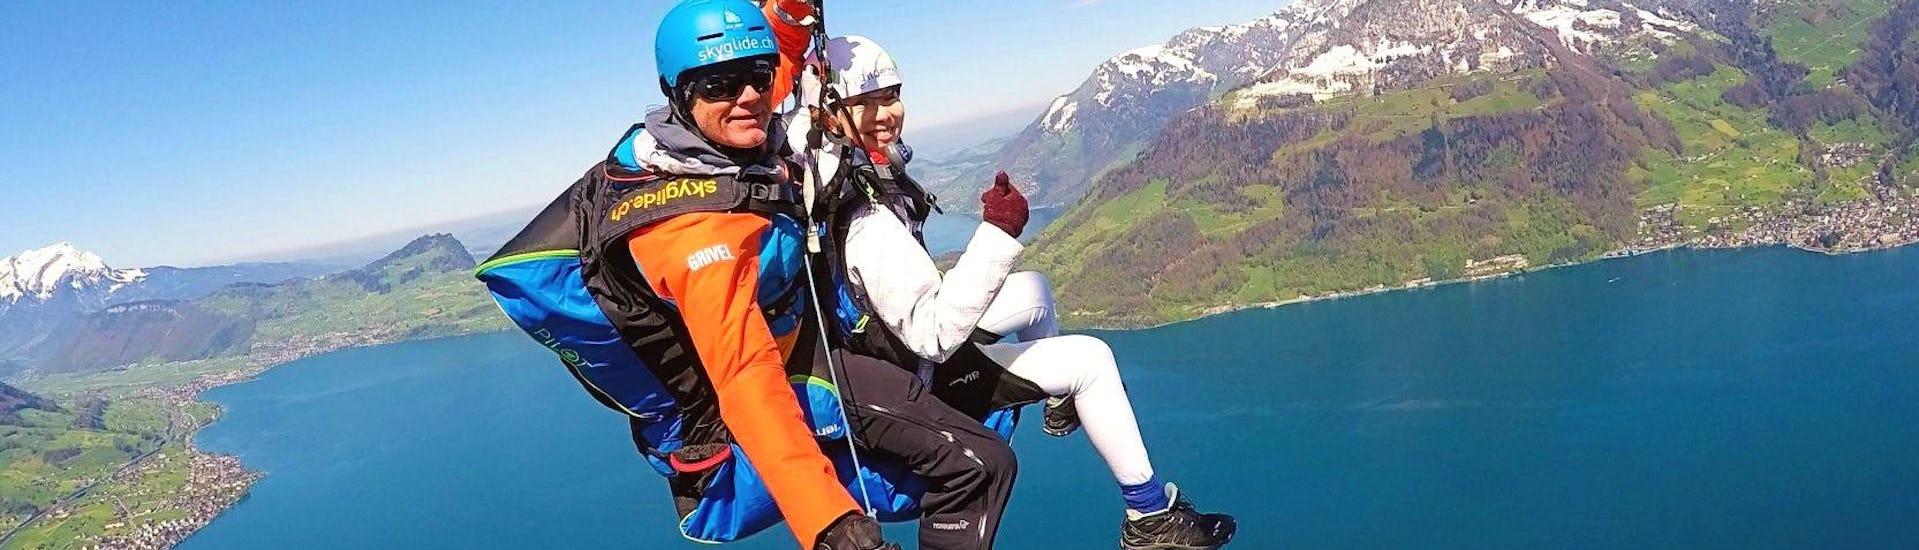 tandem-paragliding-in-niederbauen-thermic-skyglide-hero